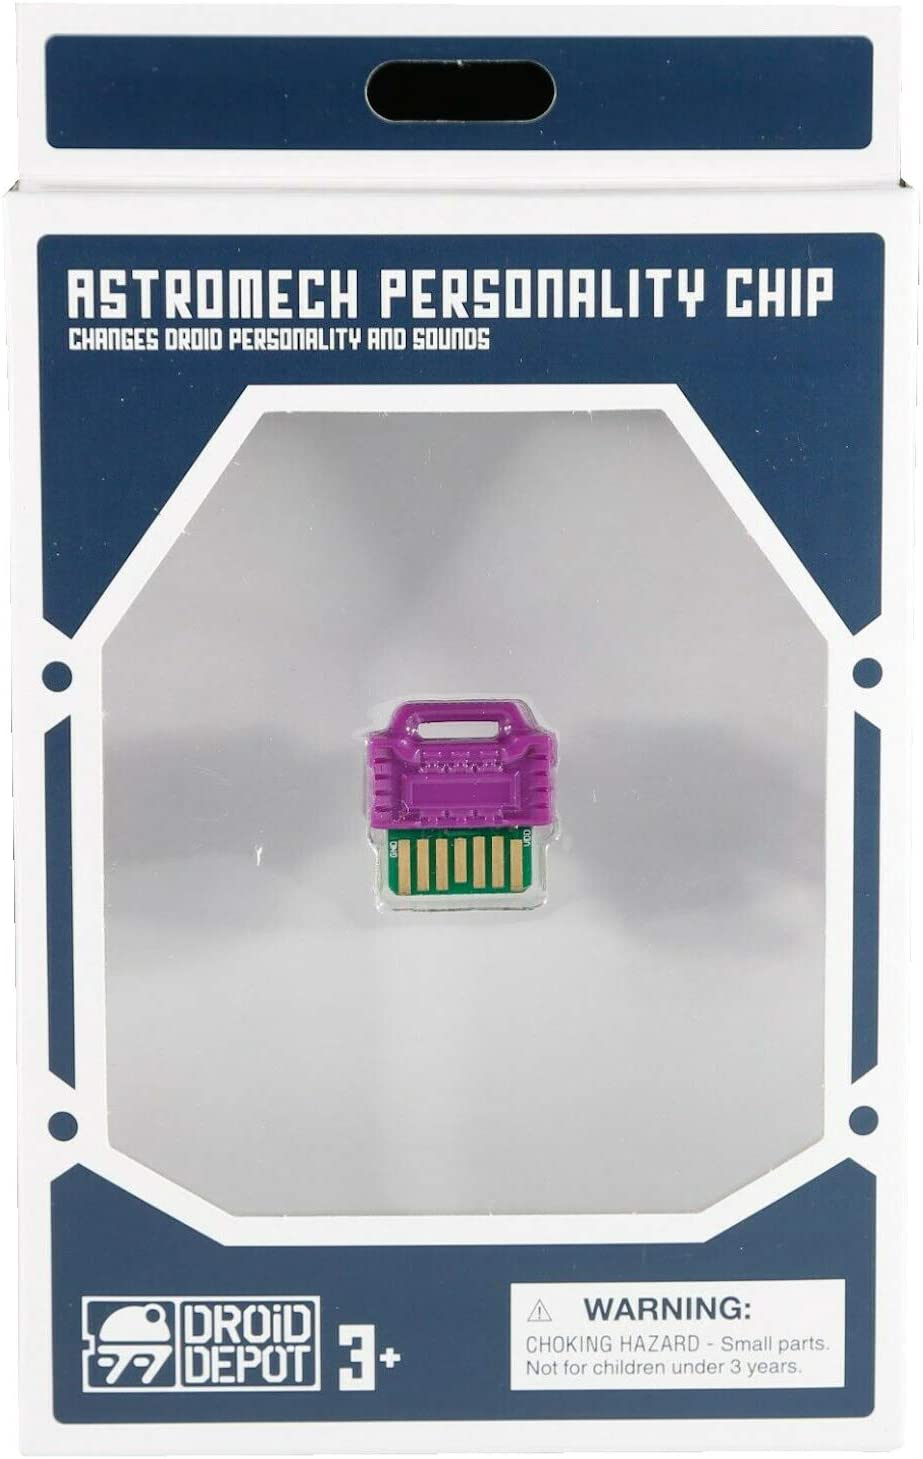 Star Wars PURPLE Astromech Personality Chip Disney Galaxy's Edge Droid Depot